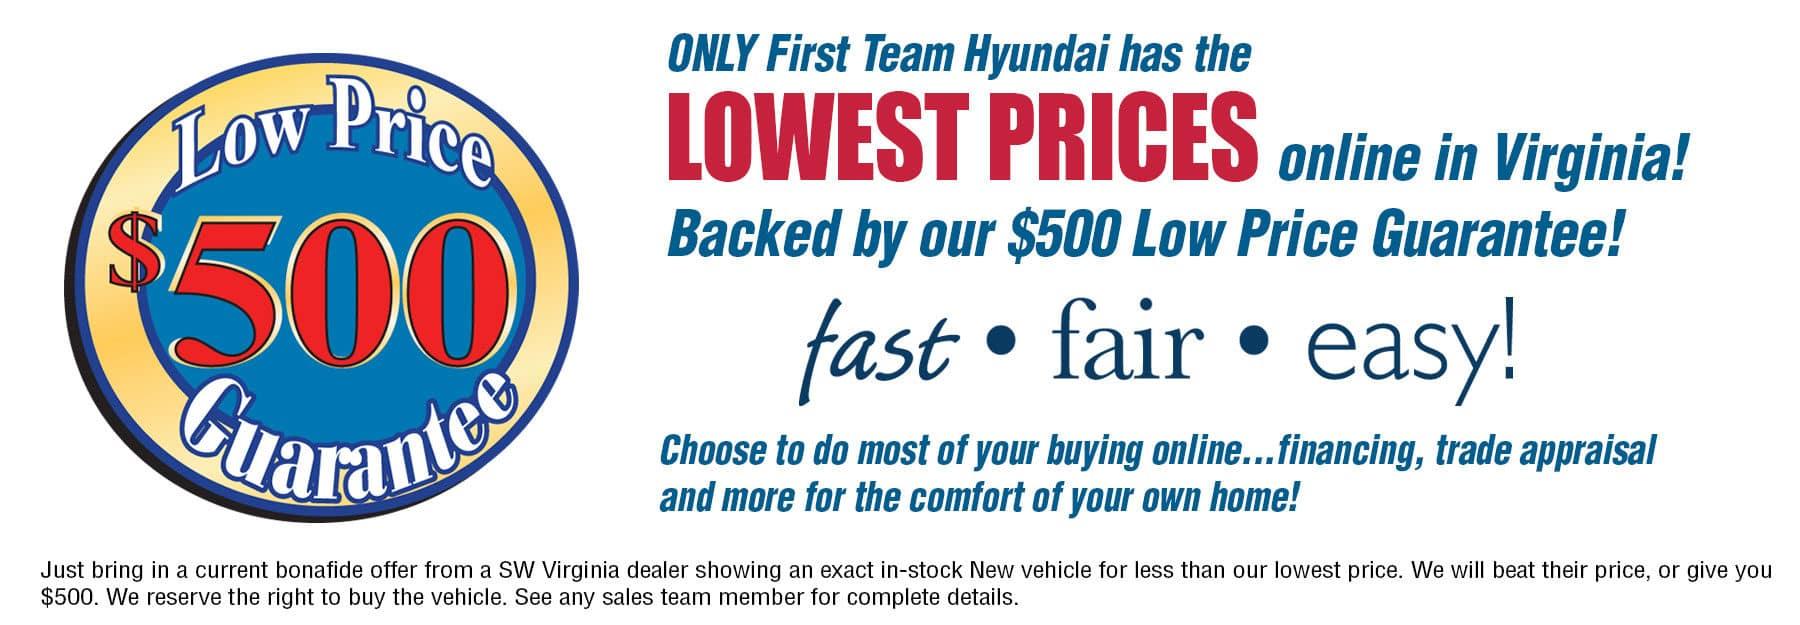 Hyundai-Low-Price-Guarantee-slide